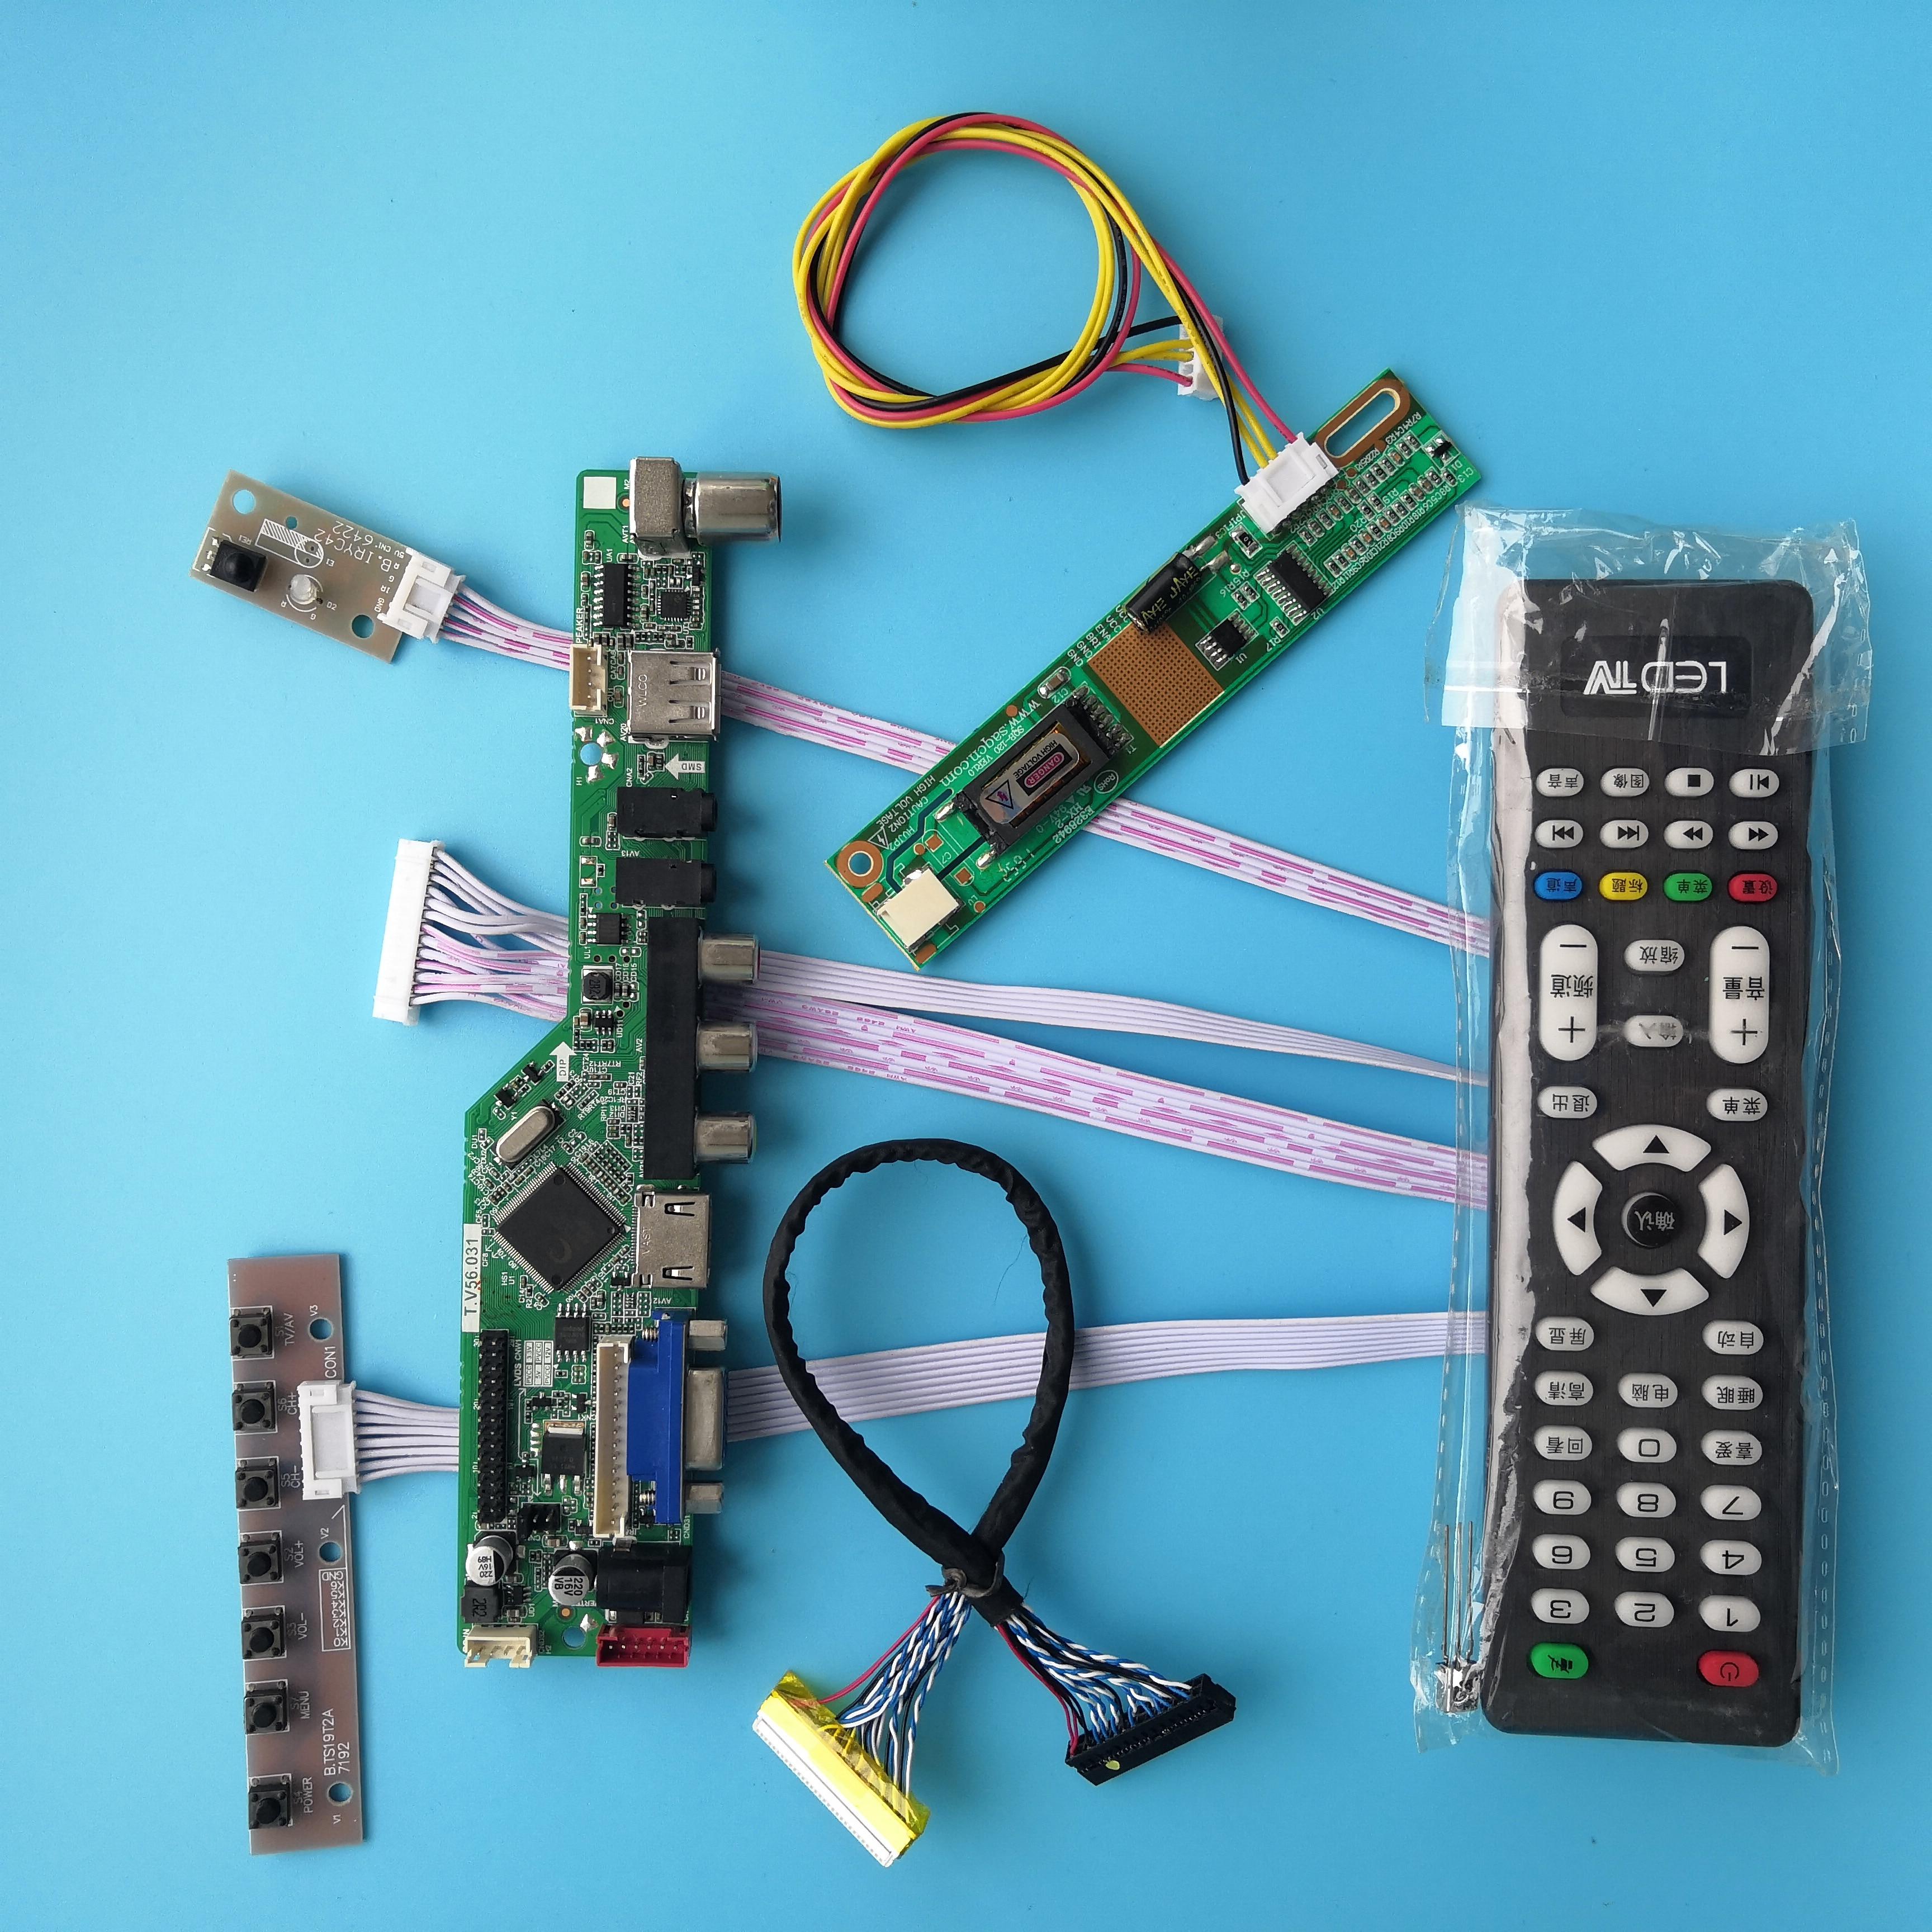 ل B141PW01 V0/V1/V2/V3/V4 30pin USB وحدة 1 مصابيح 14.1